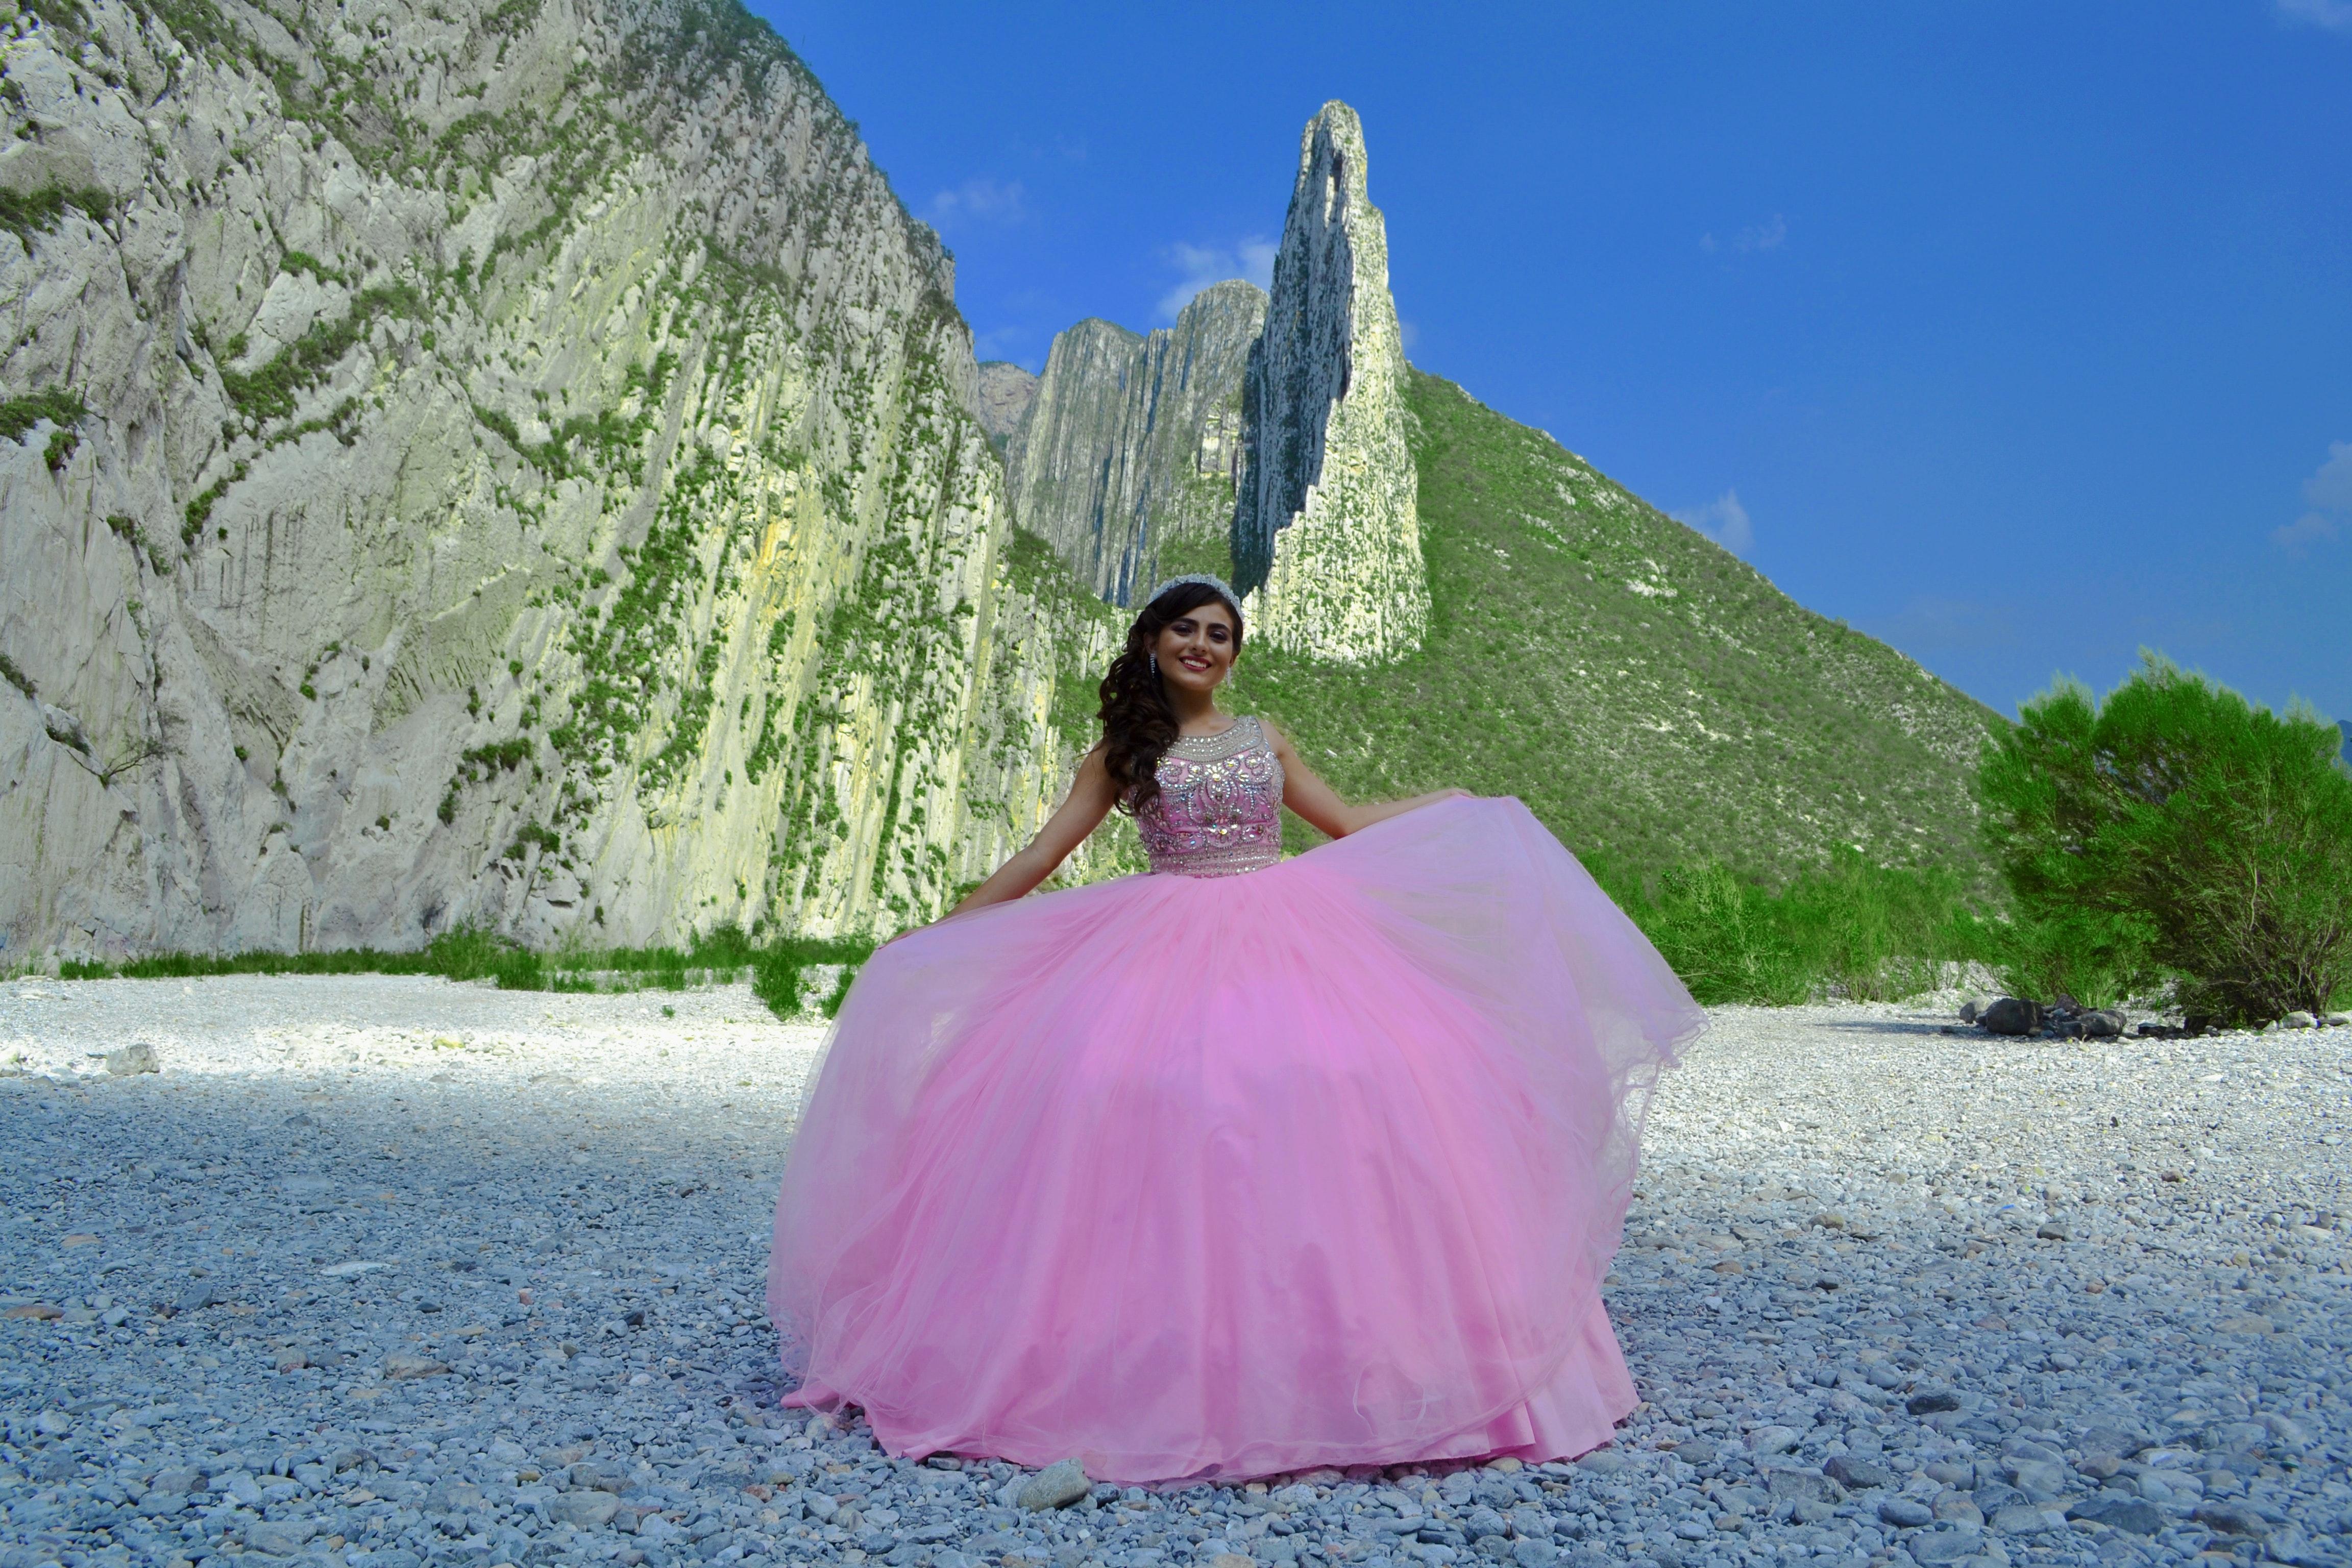 Woman Wearing Pink Gown, Adult, Photoshoot, Wedding dress, Vegetation, HQ Photo